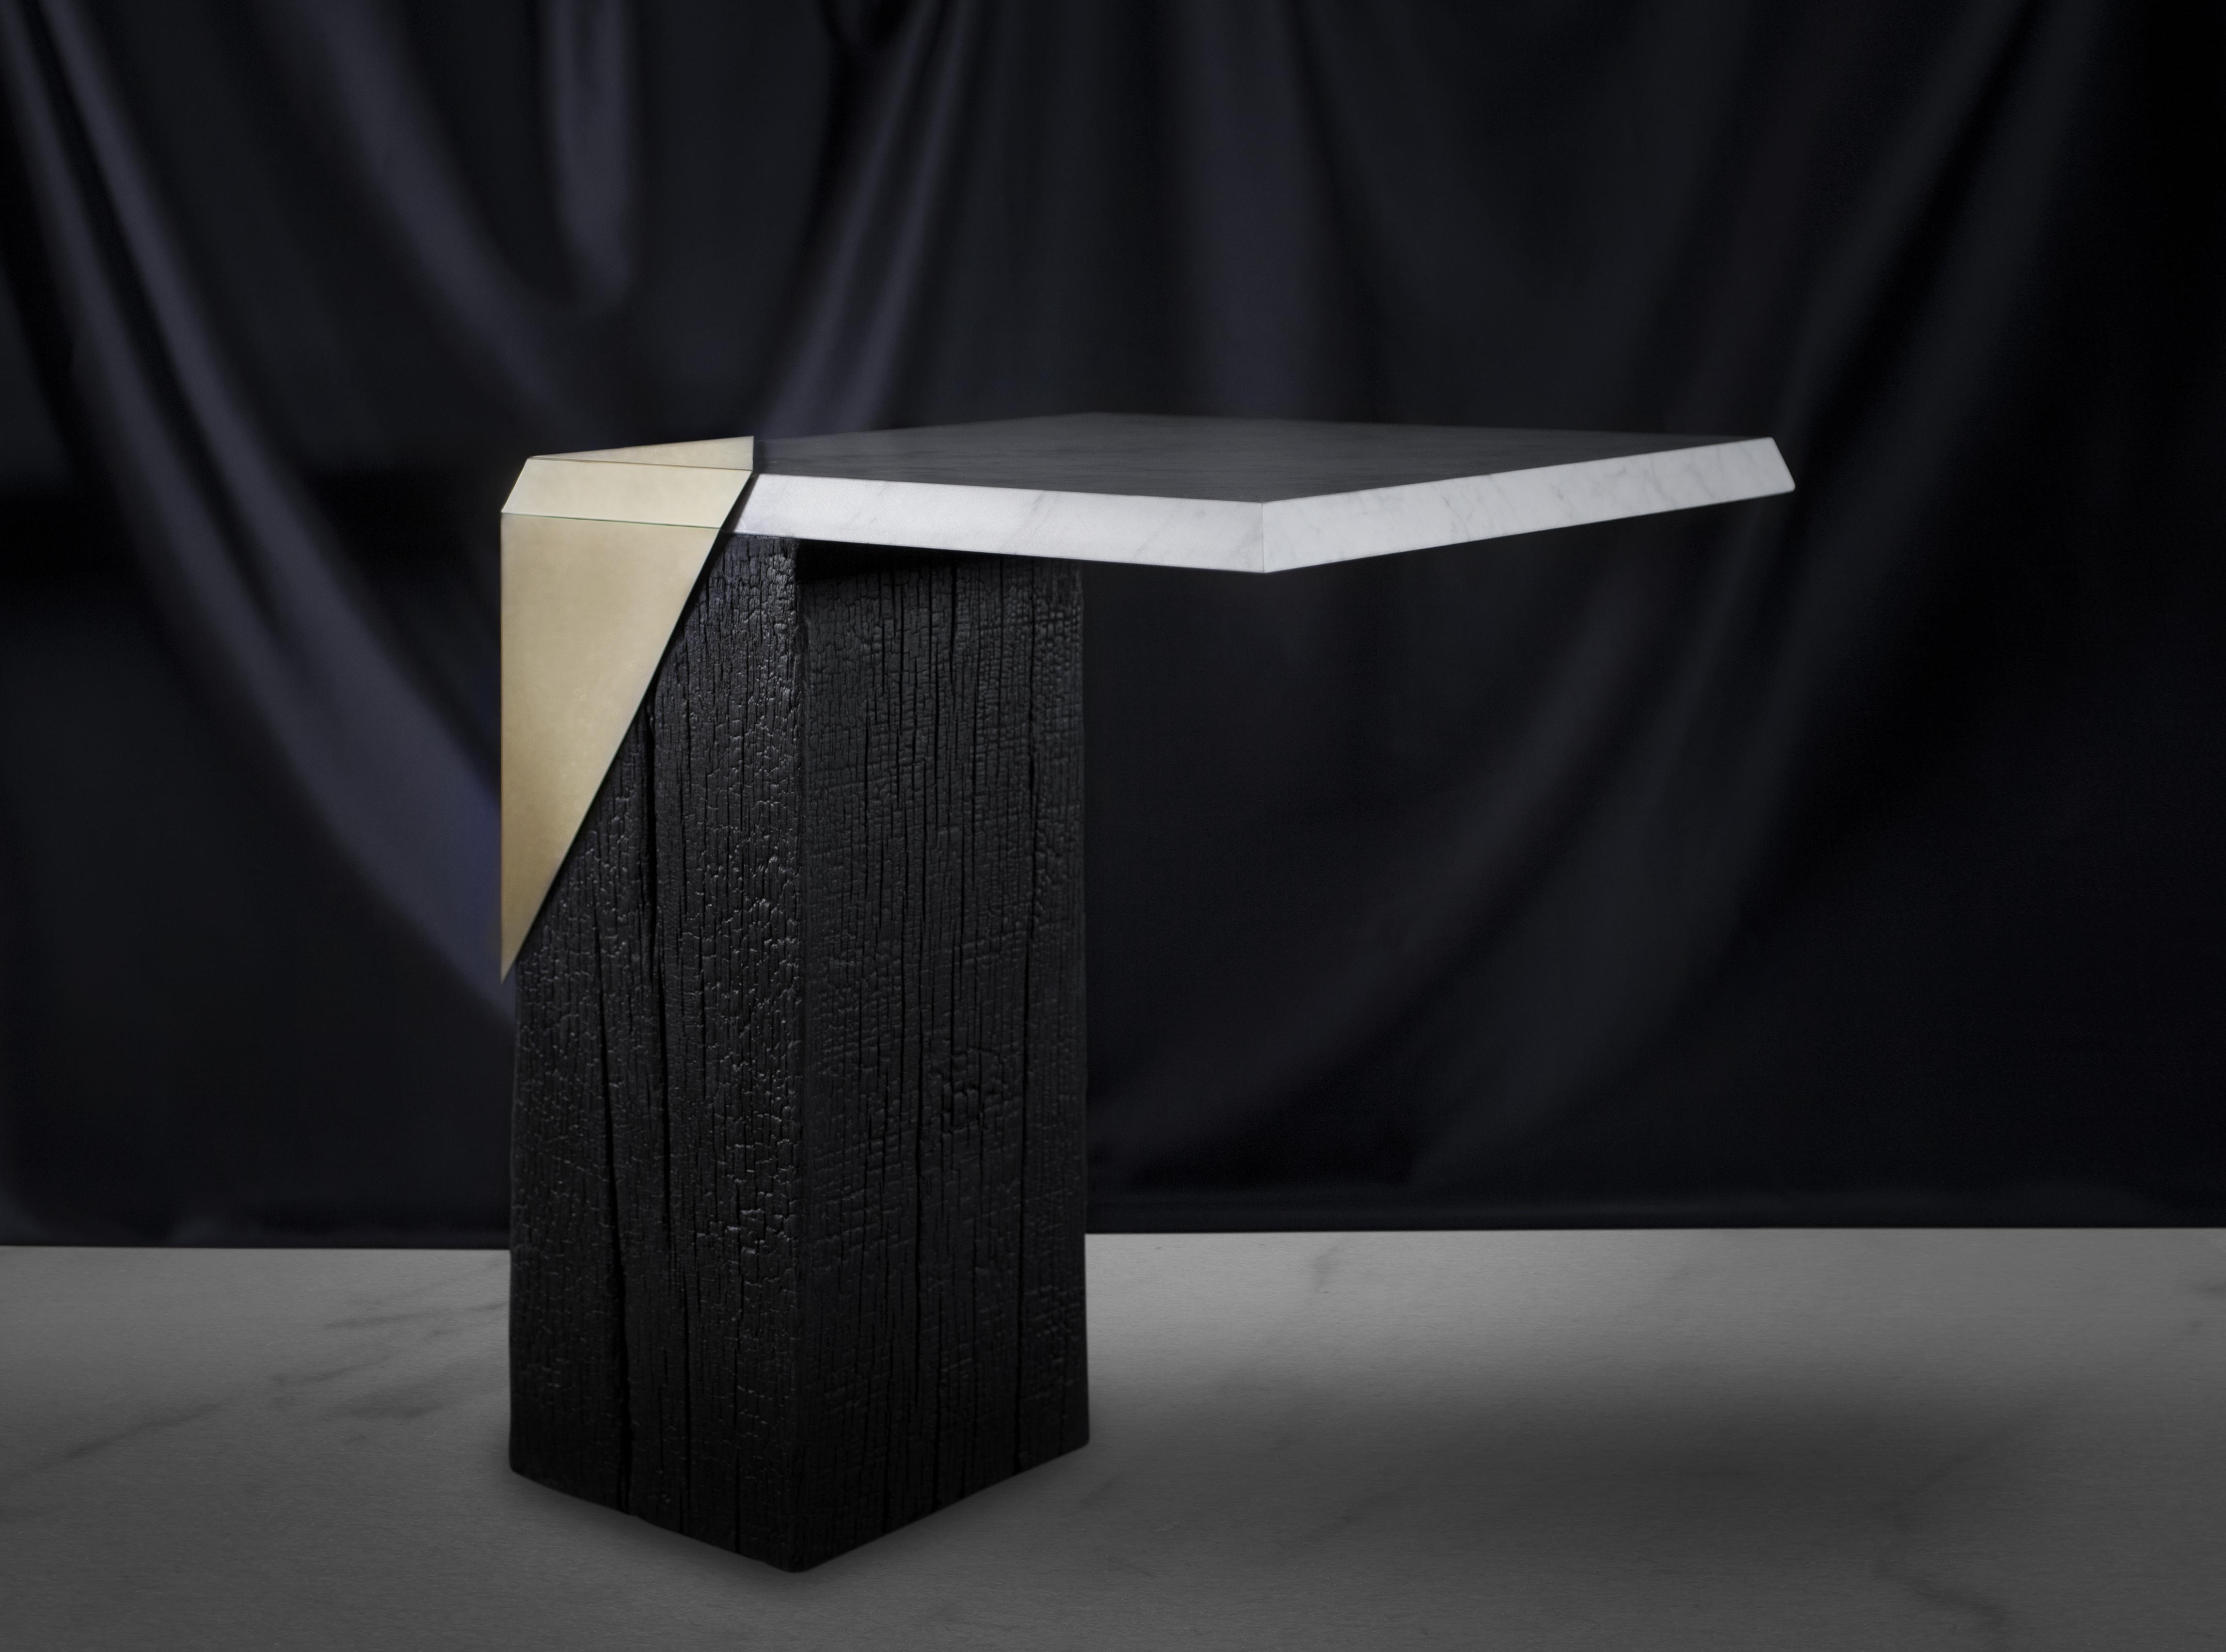 Vathro-horme-savannahbay-design